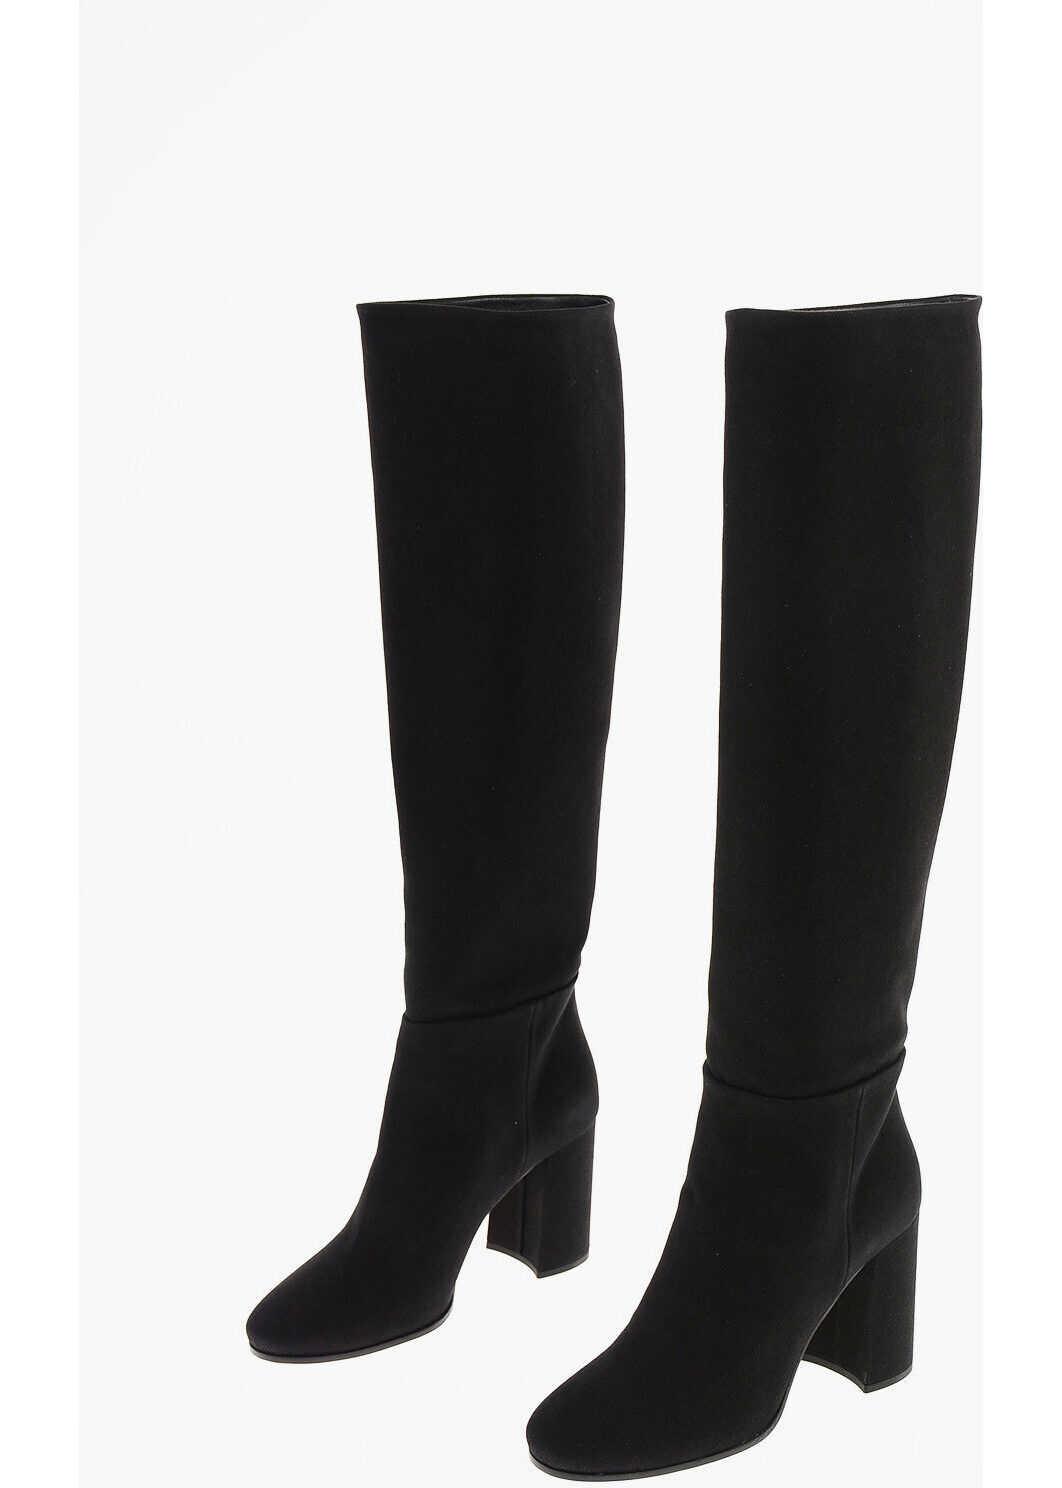 Miu Miu Denim Pull On Knee Length Boots 9 cm BLACK imagine b-mall.ro